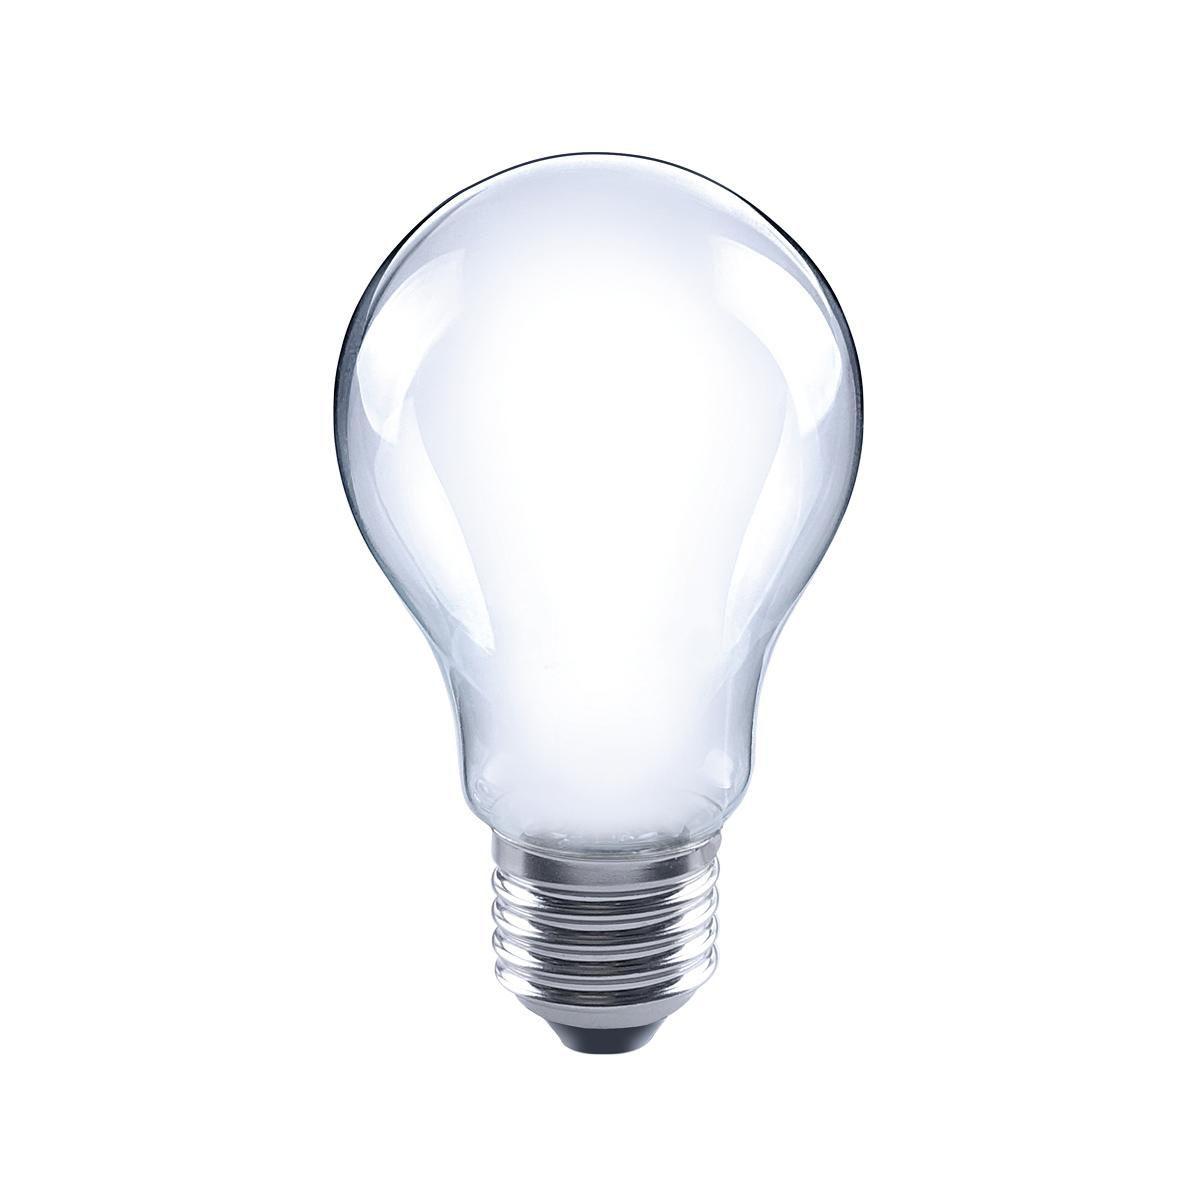 Segula   LED E27 Bulb 8 W   opal Light color  warm whiteMezzachimera Magistretti Table Lamp   Artemide   AmbienteDirect com. Artemide Lighting Spare Parts. Home Design Ideas